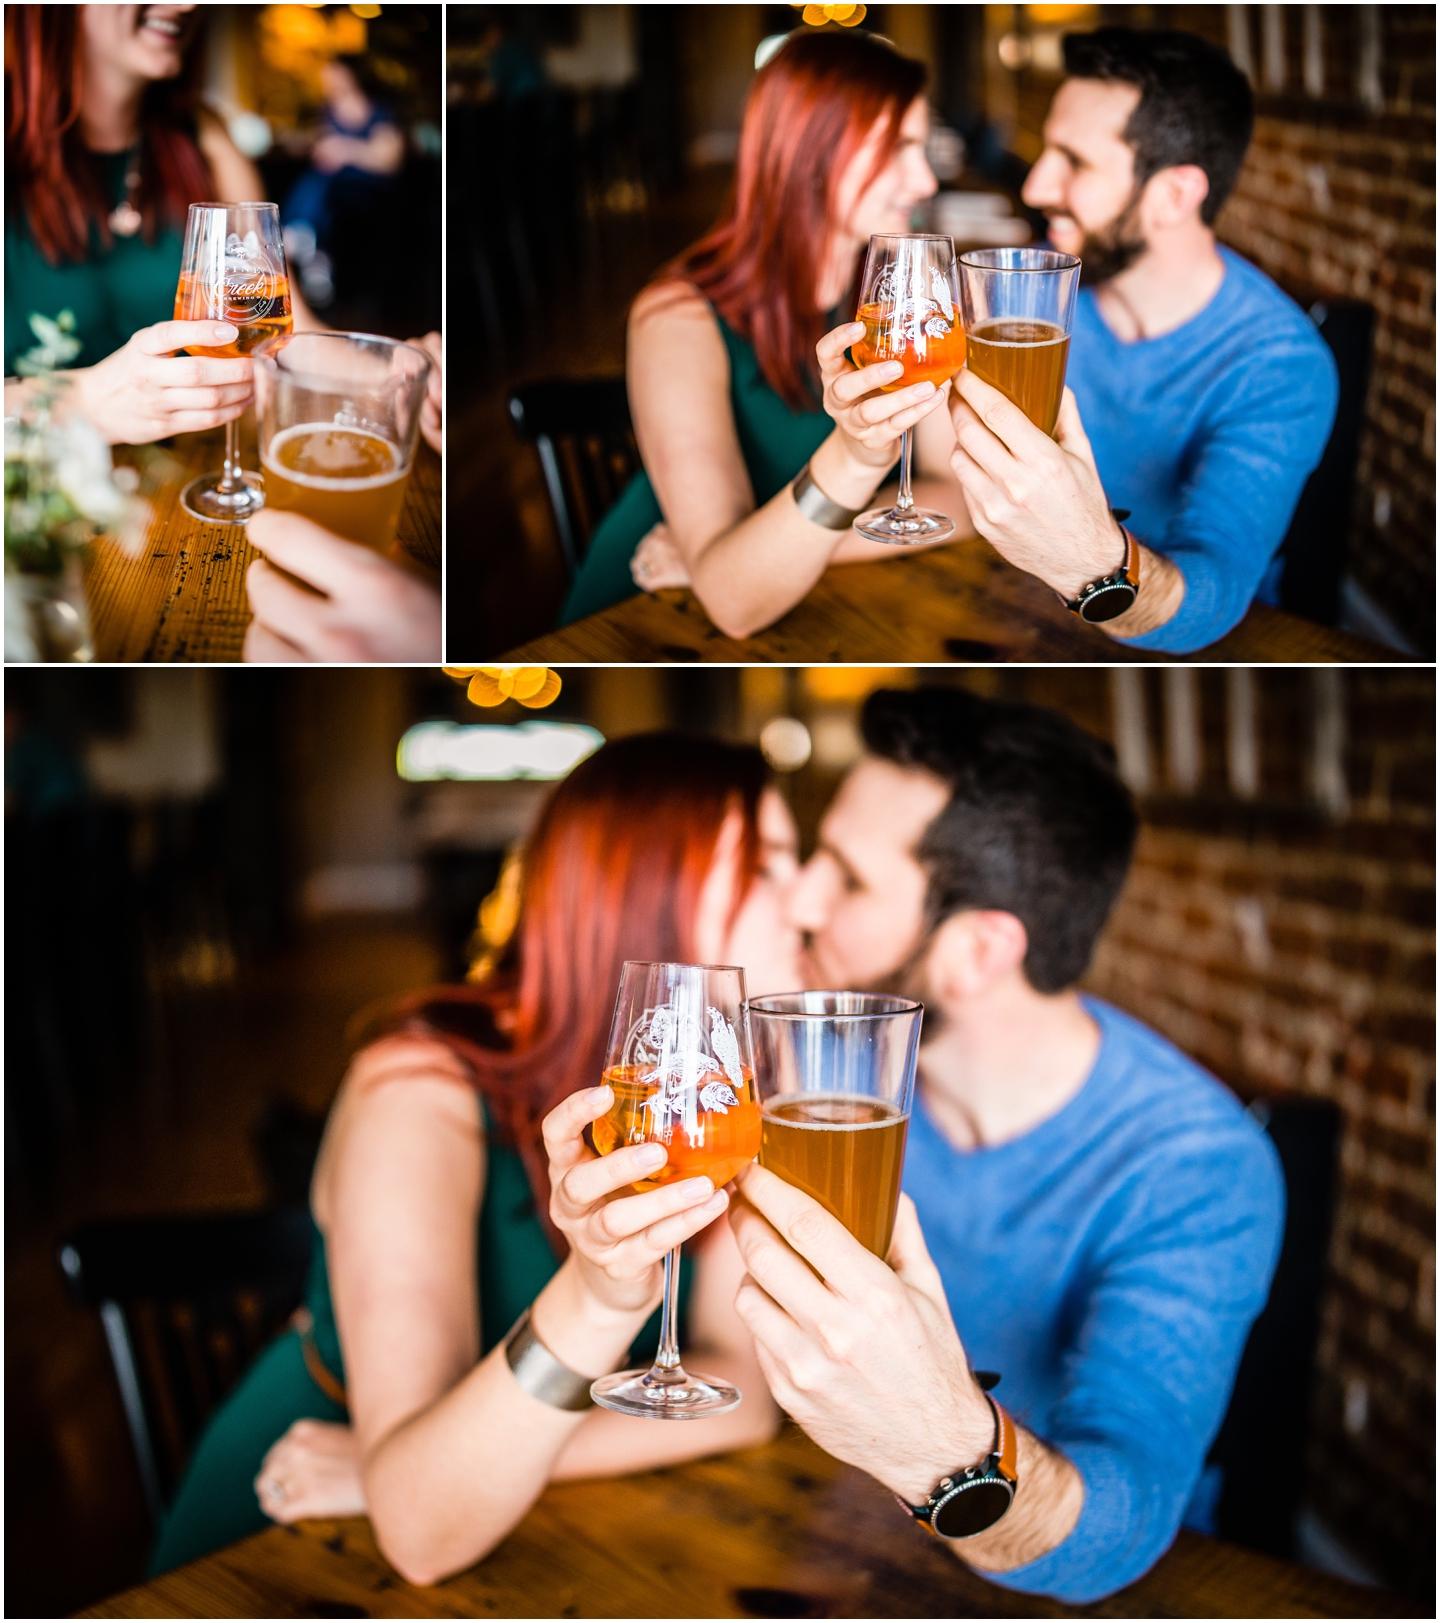 Engagement photos at a restaurant